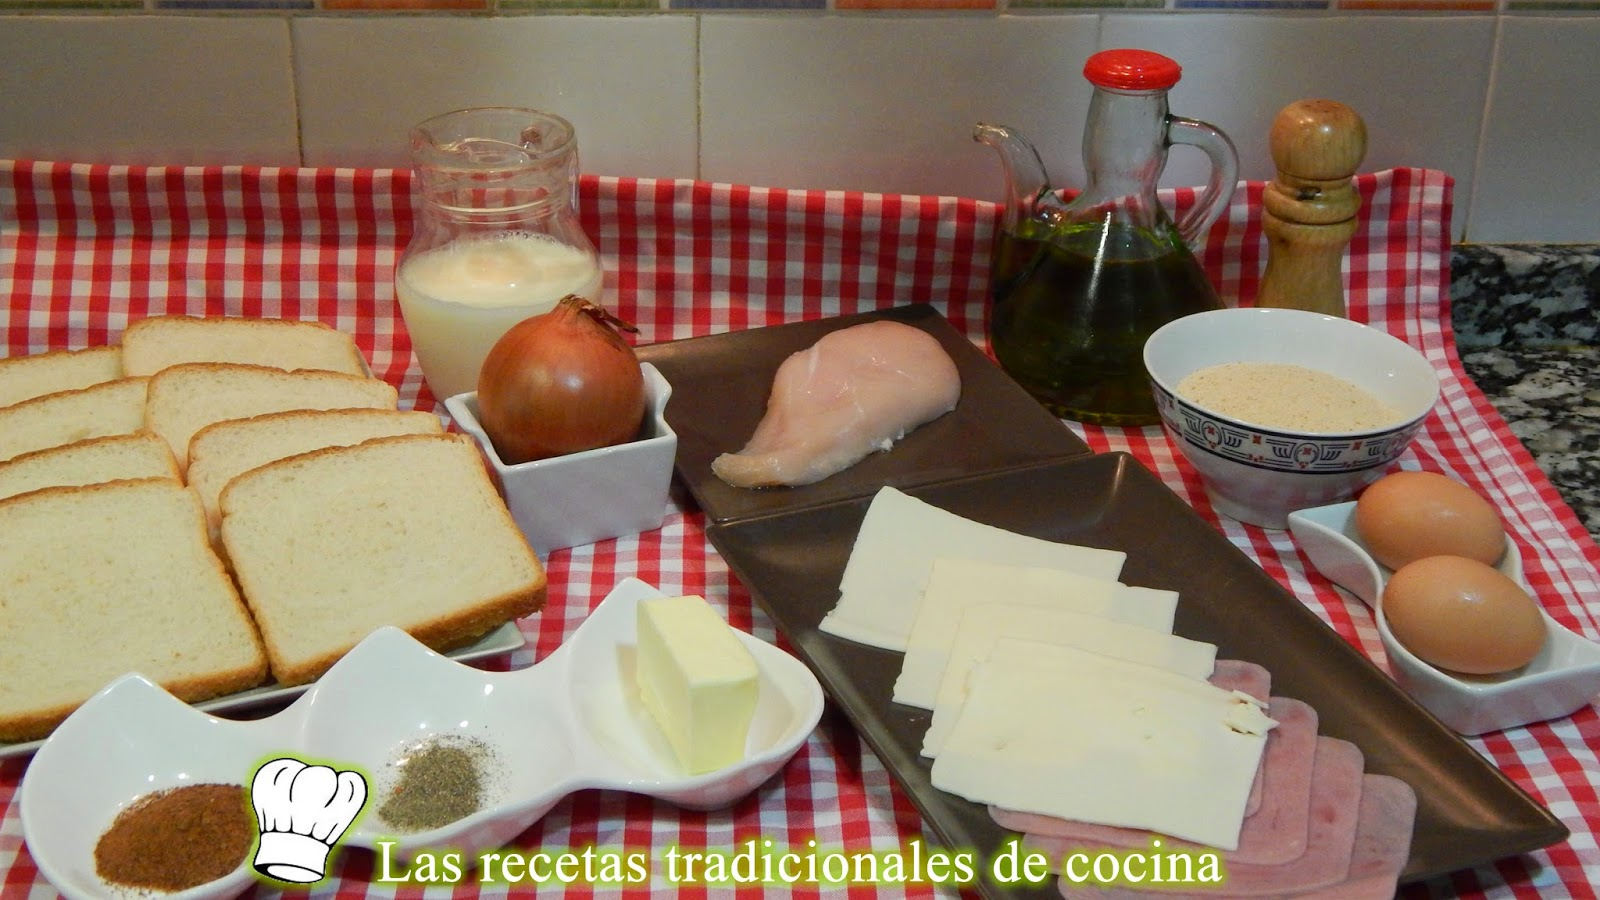 receta del Croque monsieur o sandwich Monte cristo